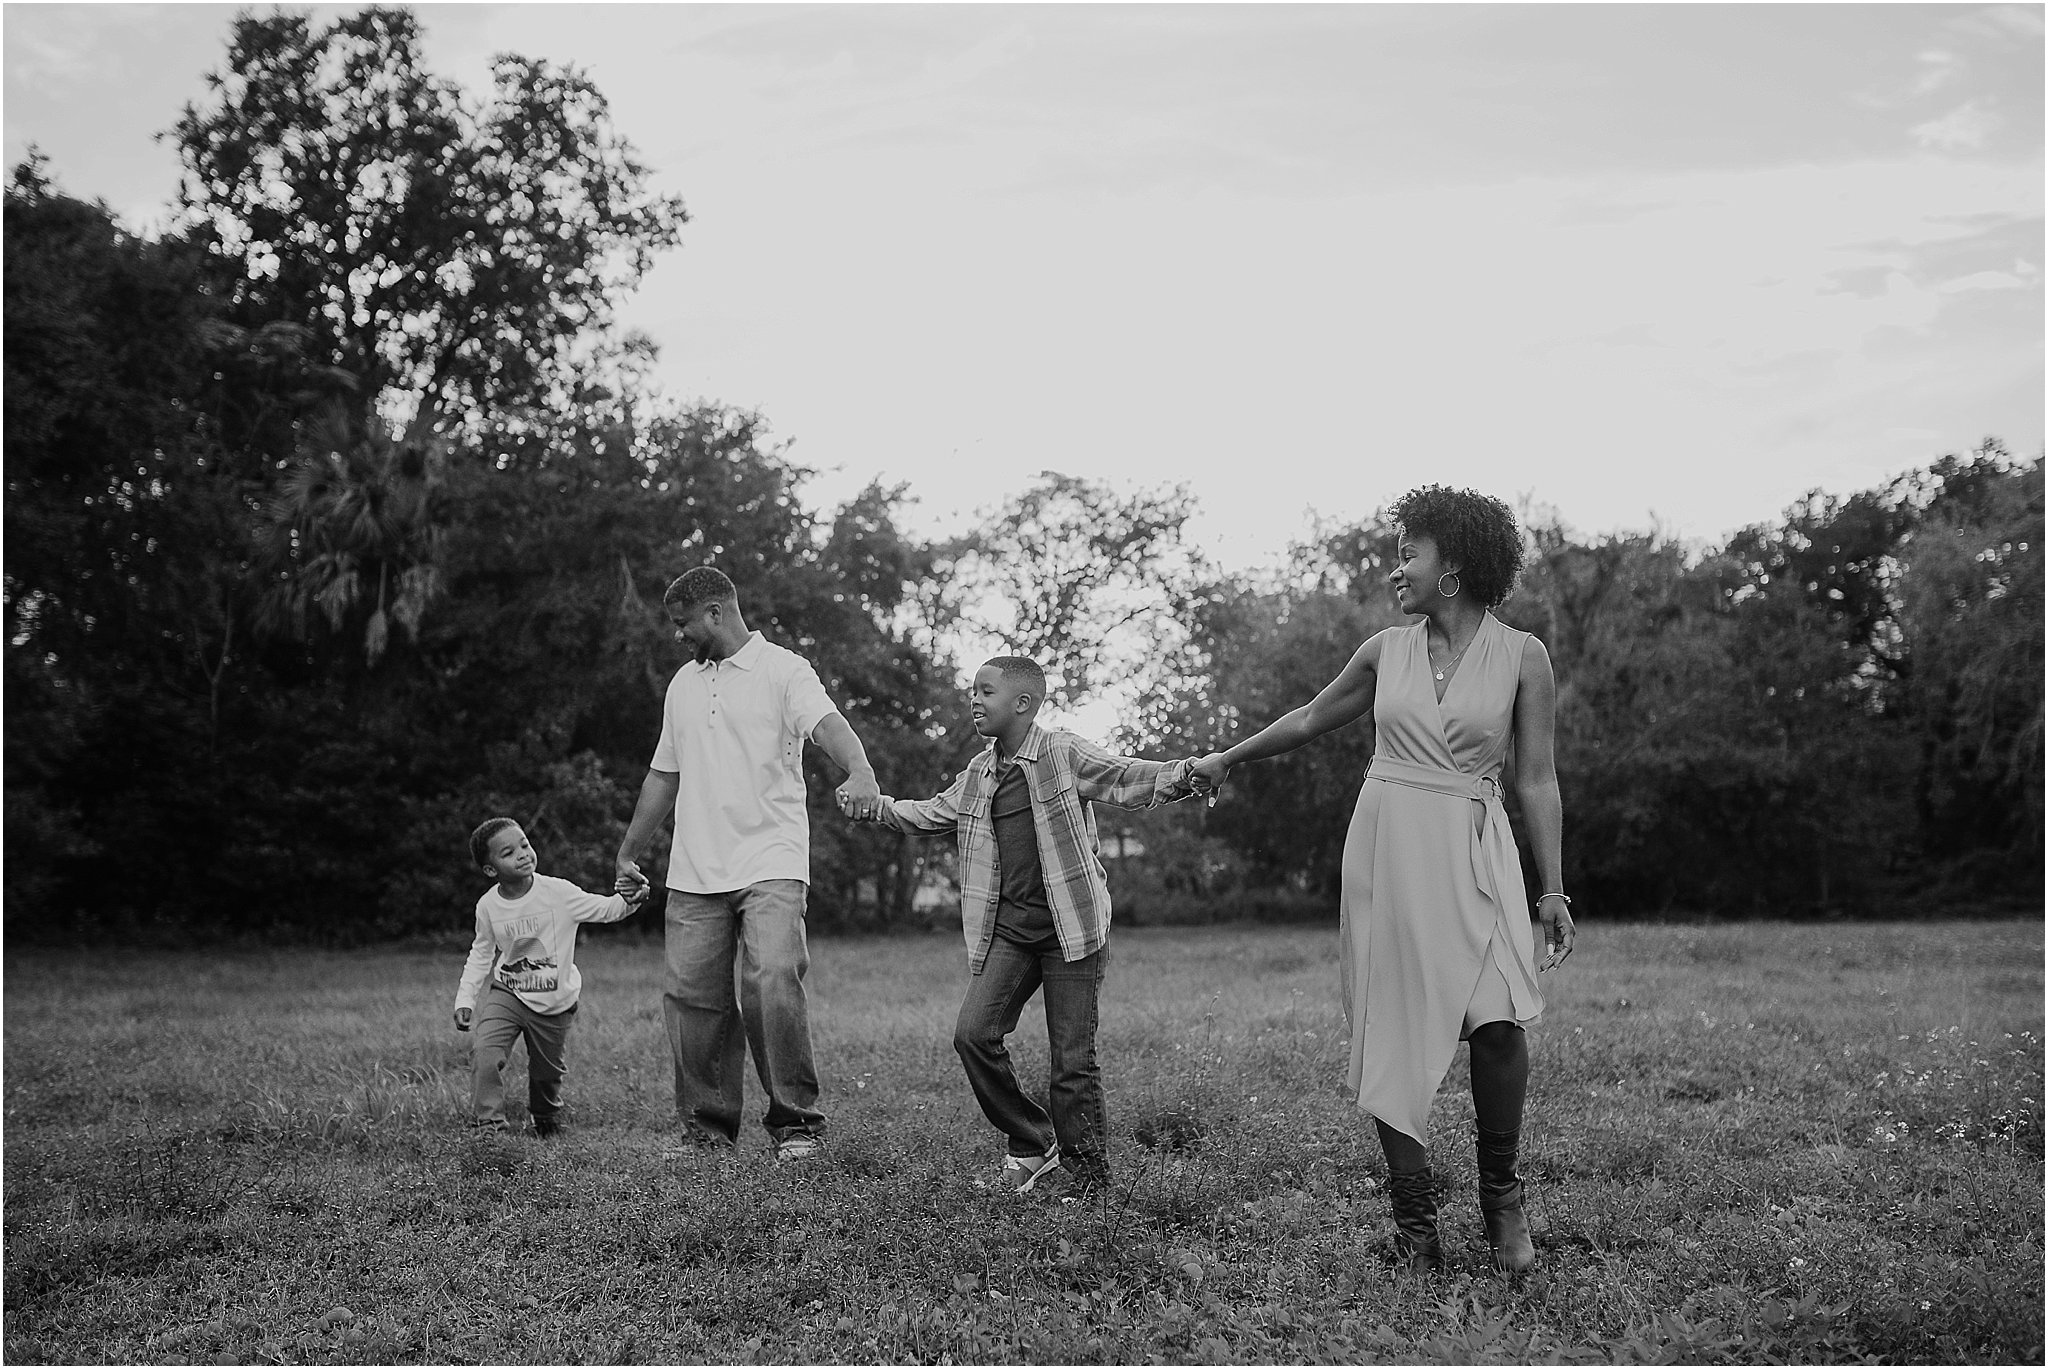 Ashley_Rogers_Photography_Orlando_Non-Posed_Newborn_Family_Lifestyle_Photographer_0648.jpg